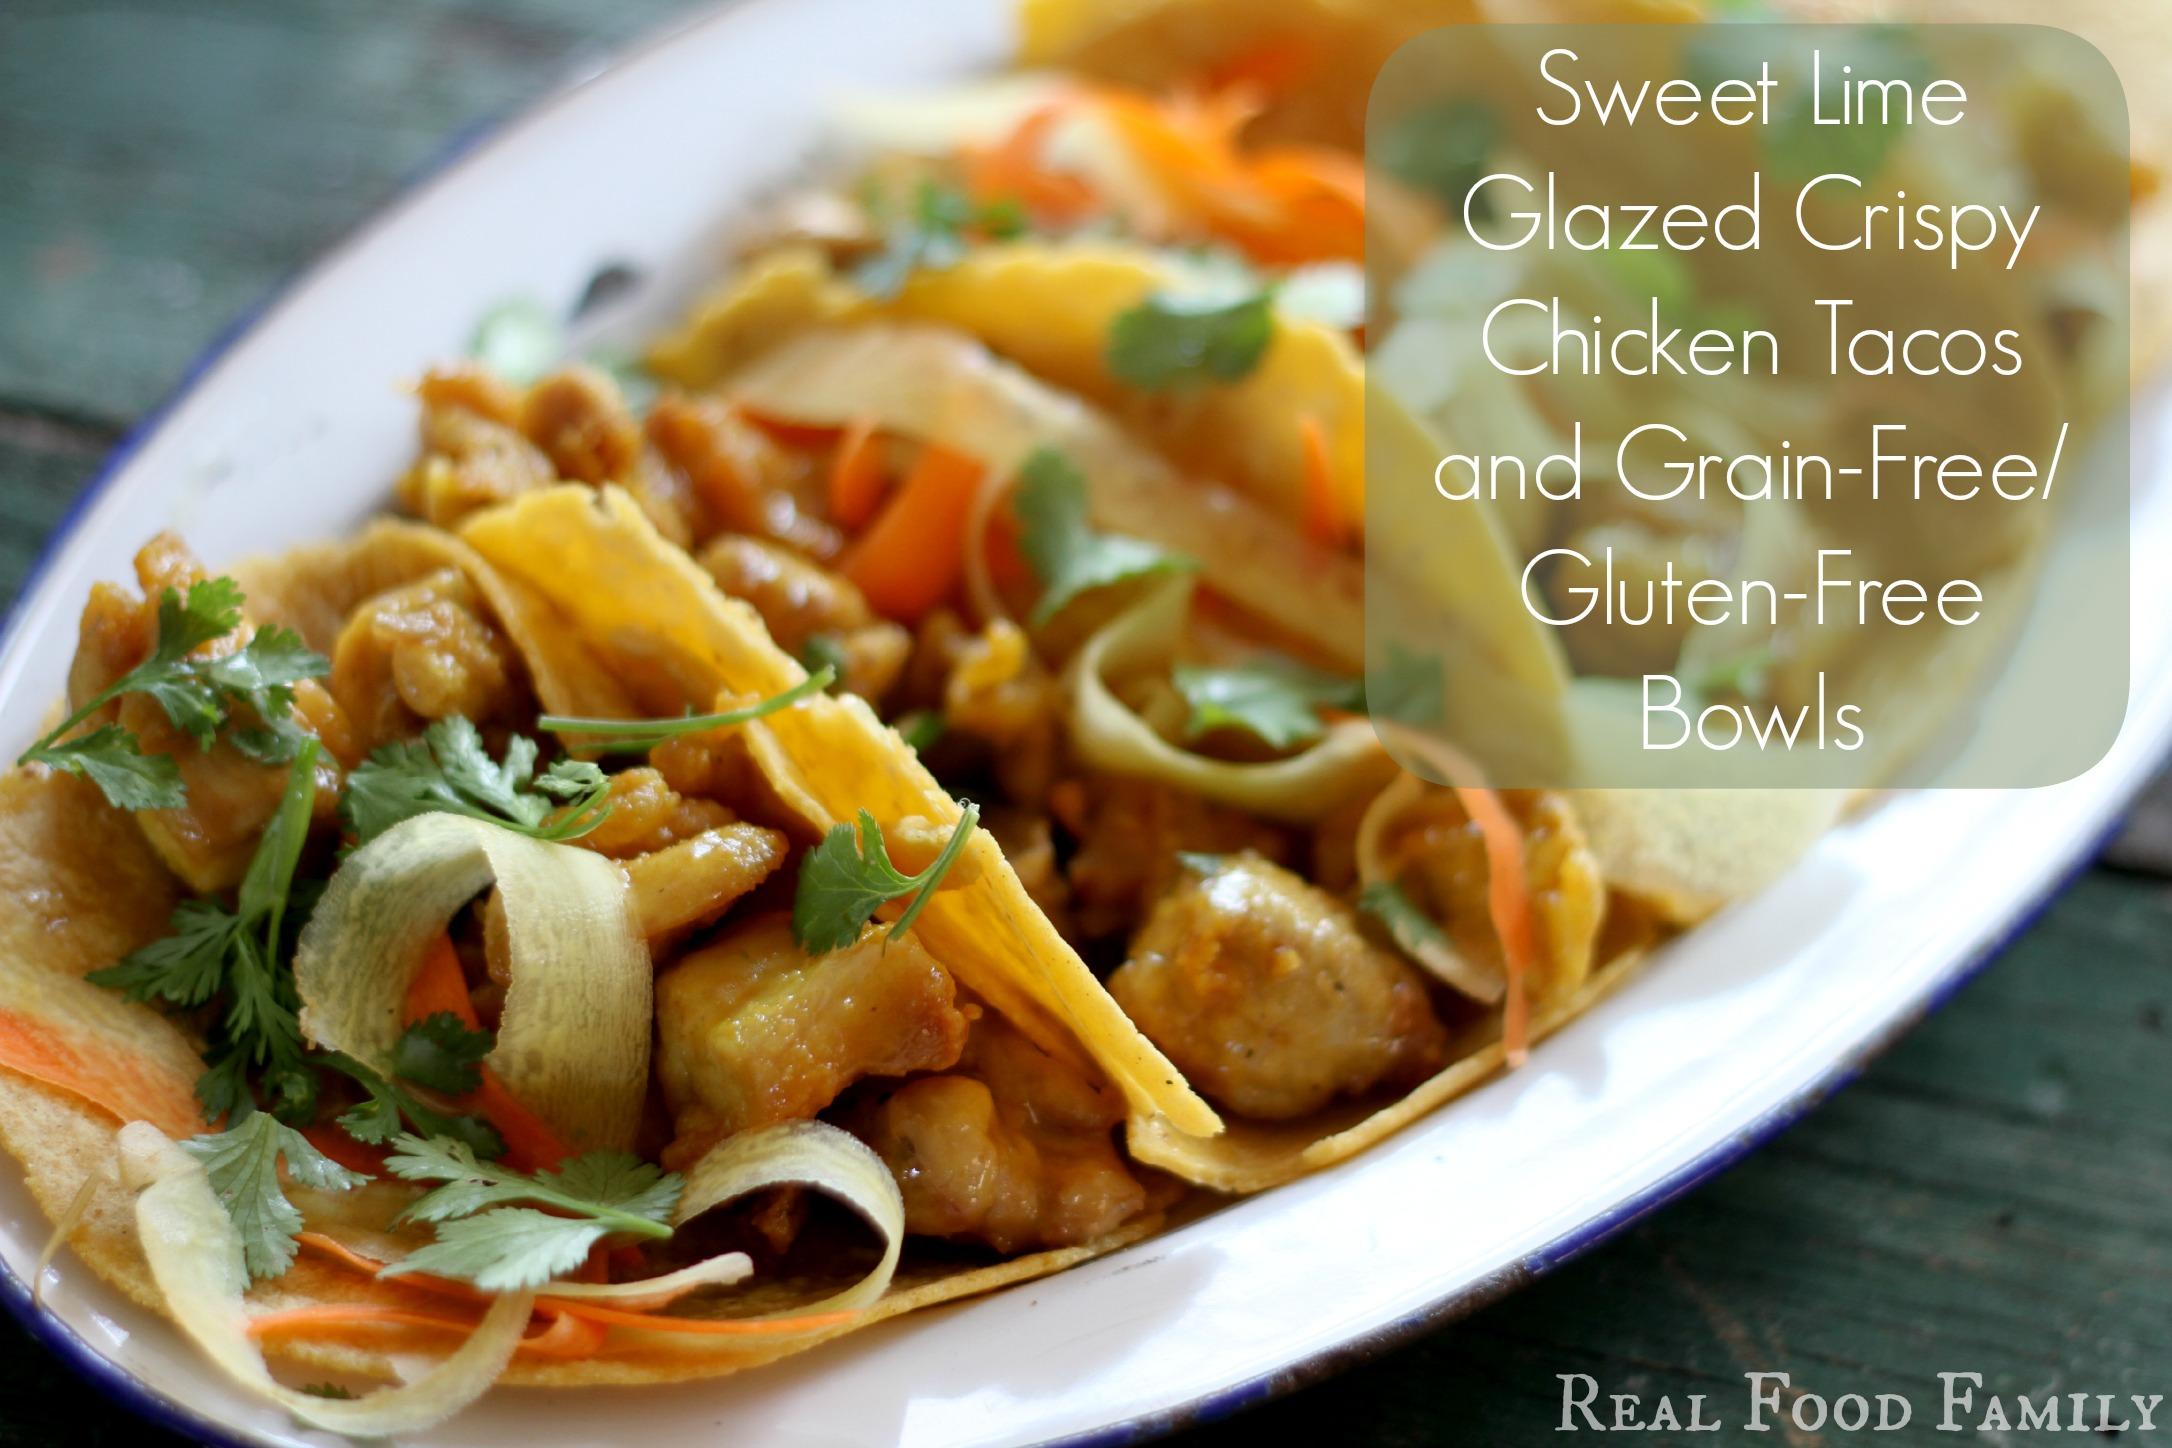 Sweet Lime Glazed Crispy Chicken Tacos + Grain Free Bowls